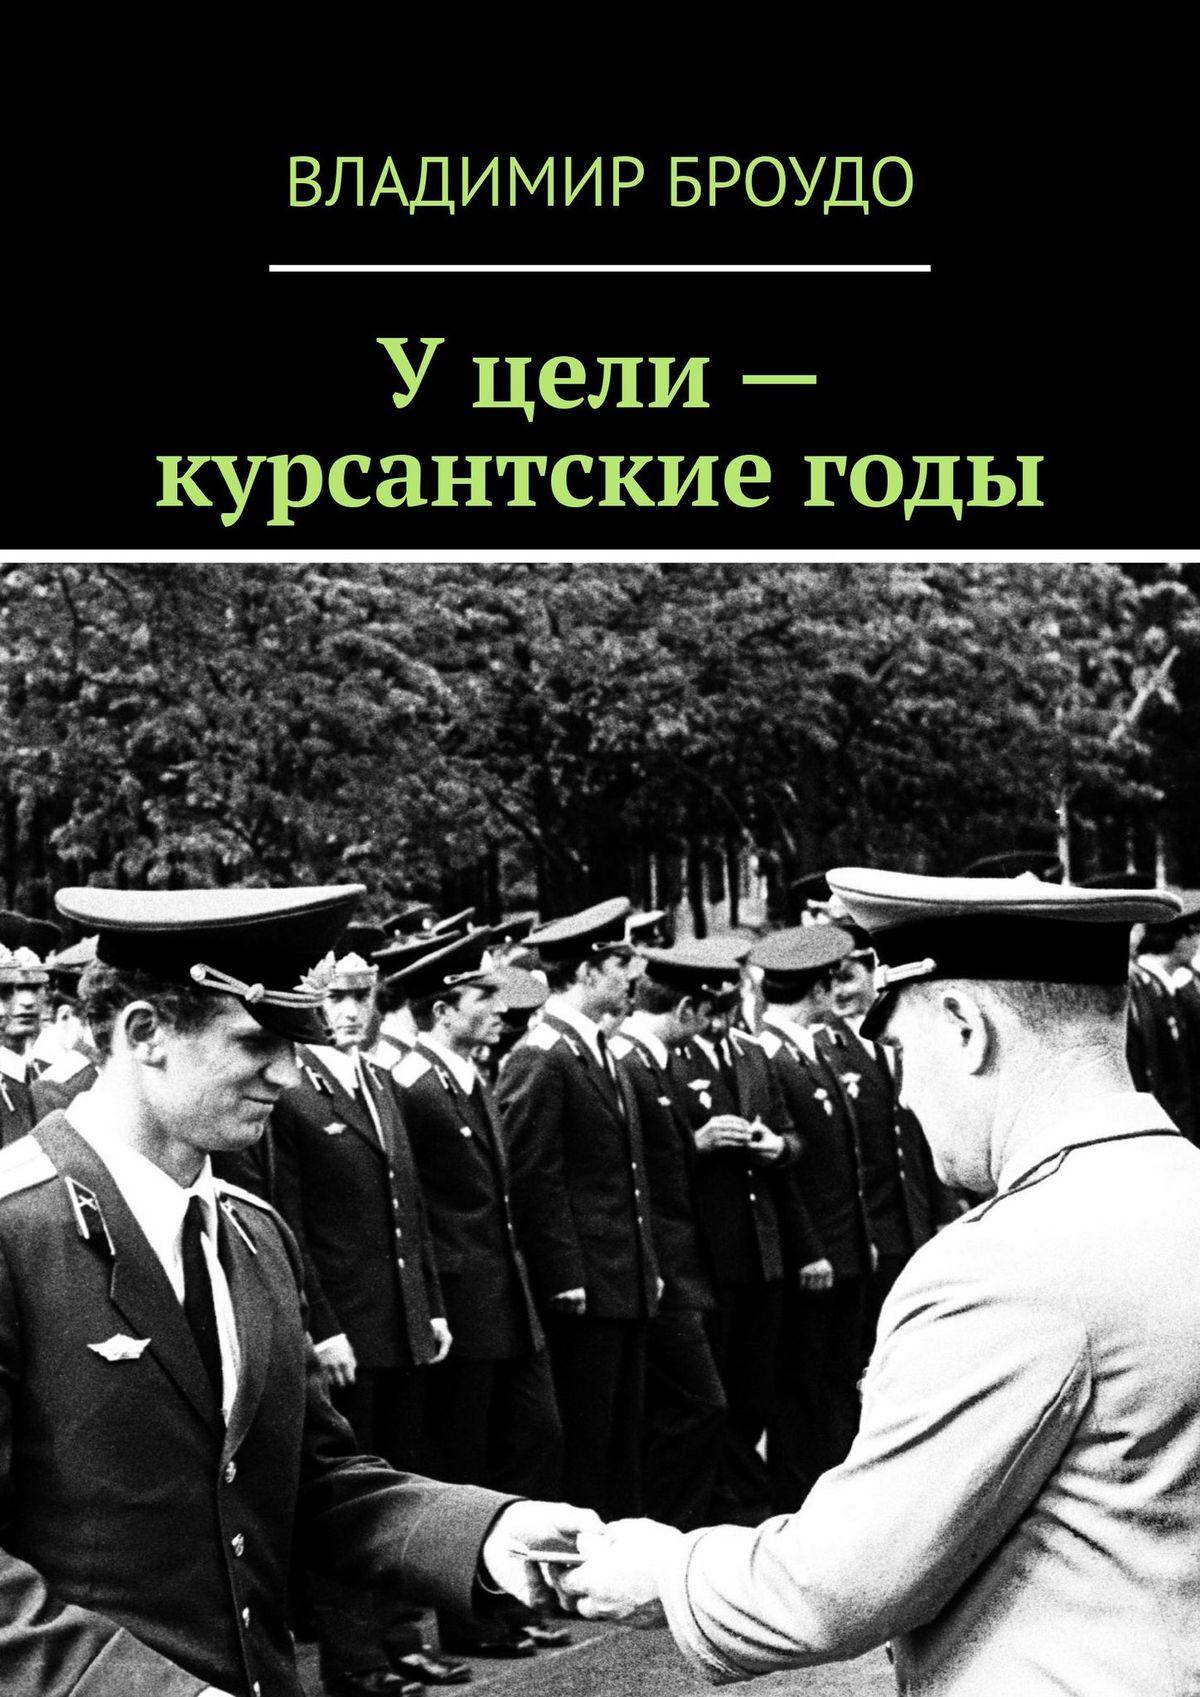 Уцели– курсантскиегоды_Владимир Броудо